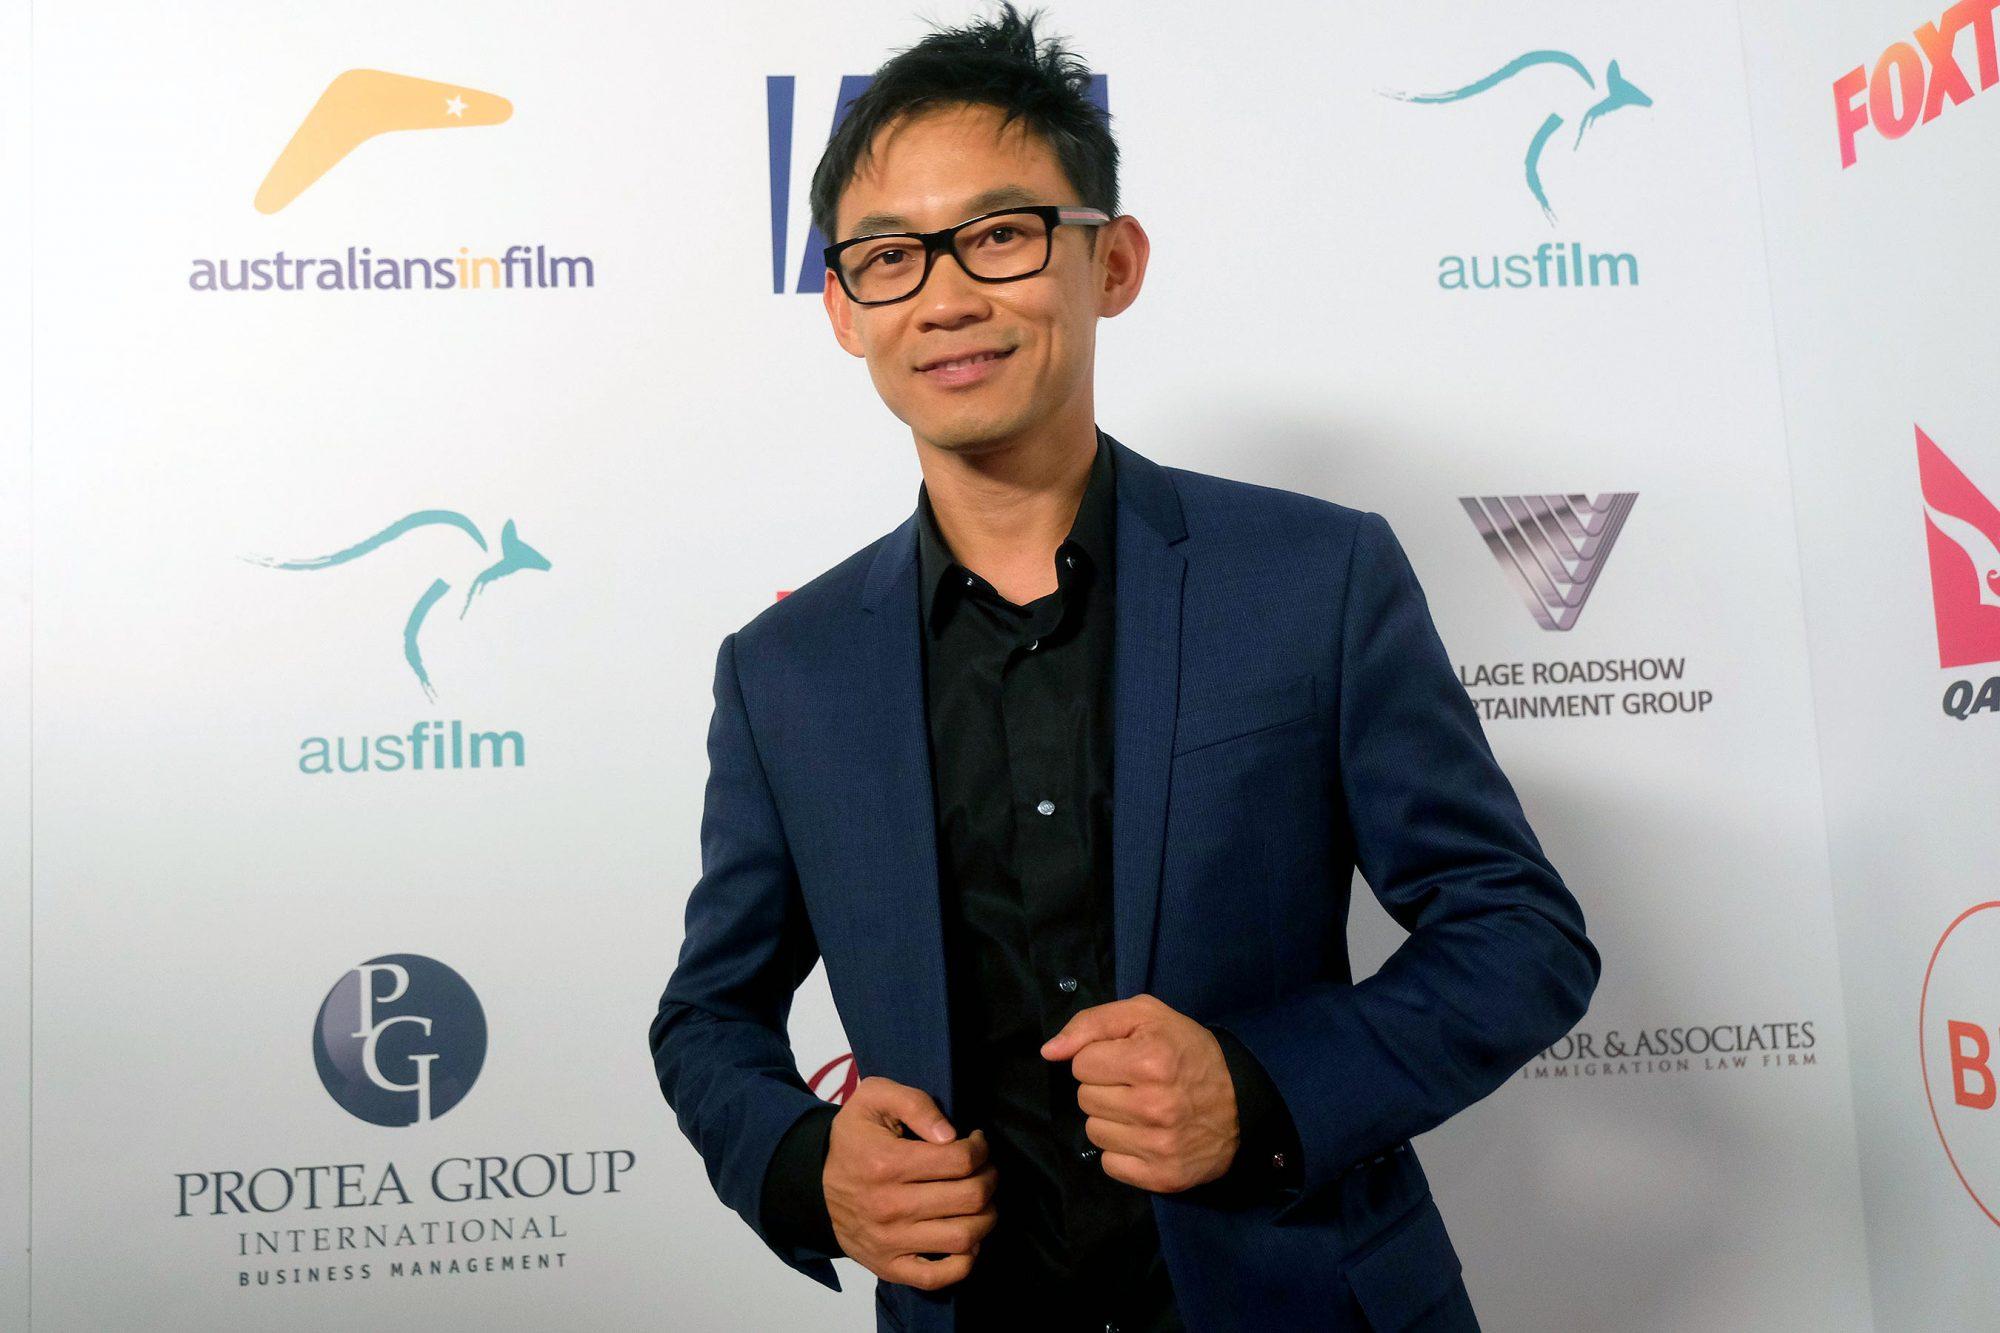 Australians In Film's 5th Annual Awards Gala - Red Carpet